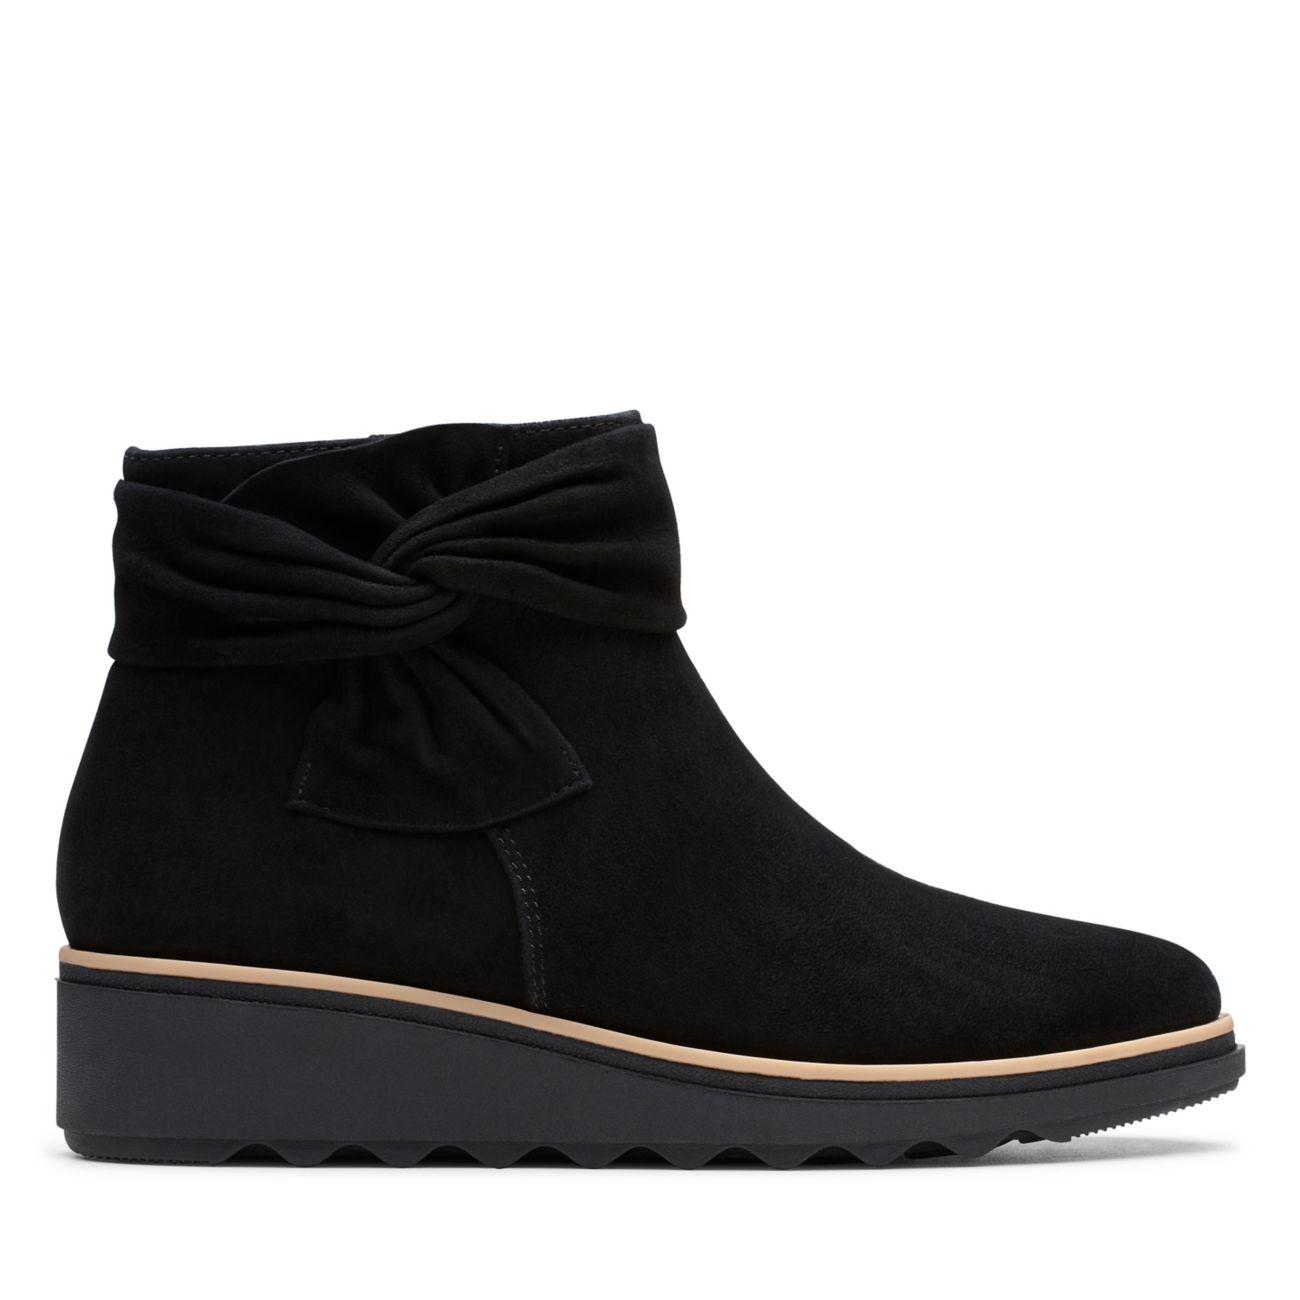 Sharon Salon Black Suede-Womens Boots-Clarks® Shoes Official Site    Clarks